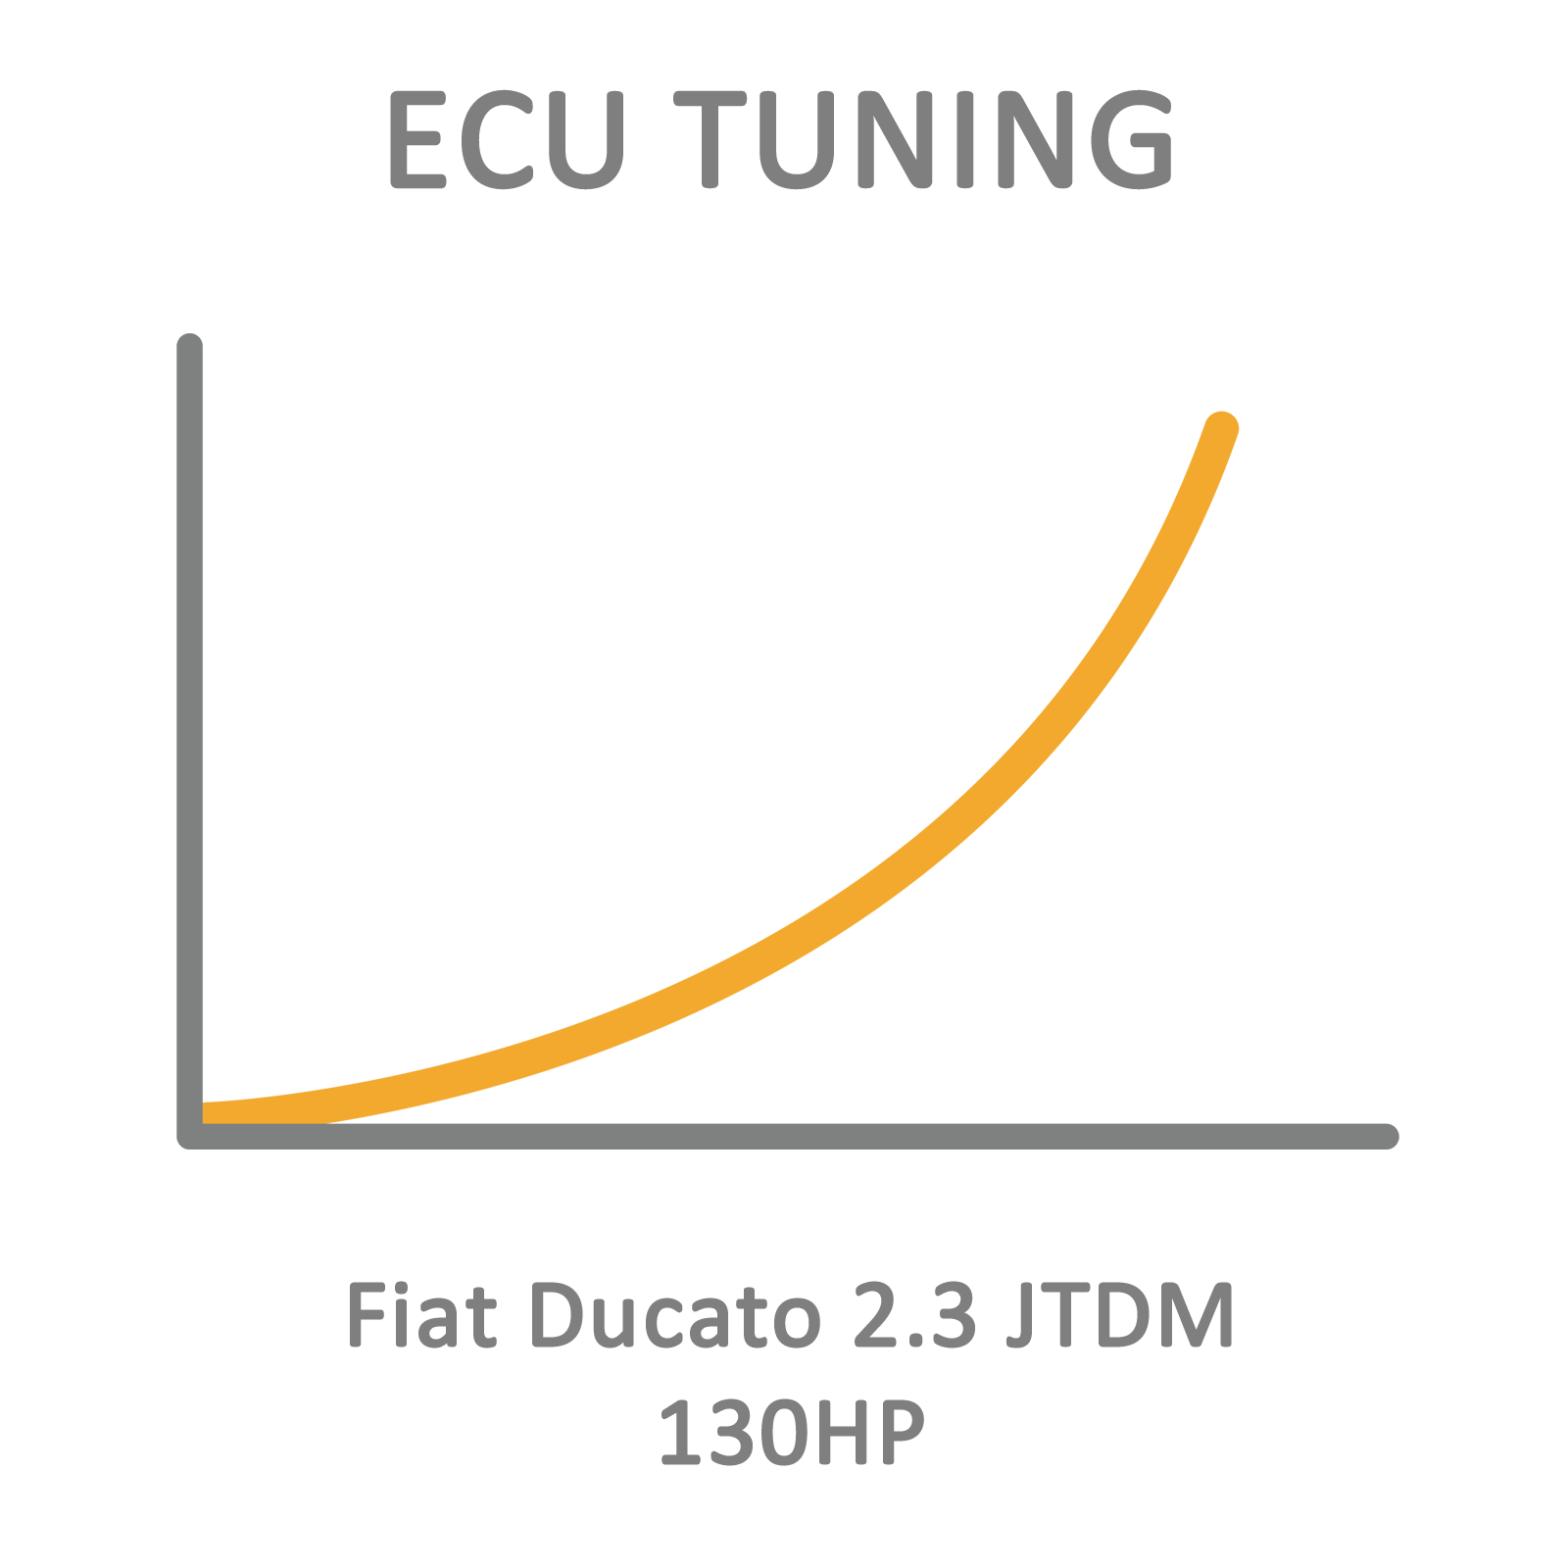 Fiat Ducato 2.3 JTDM 130HP ECU Tuning Remapping Programming